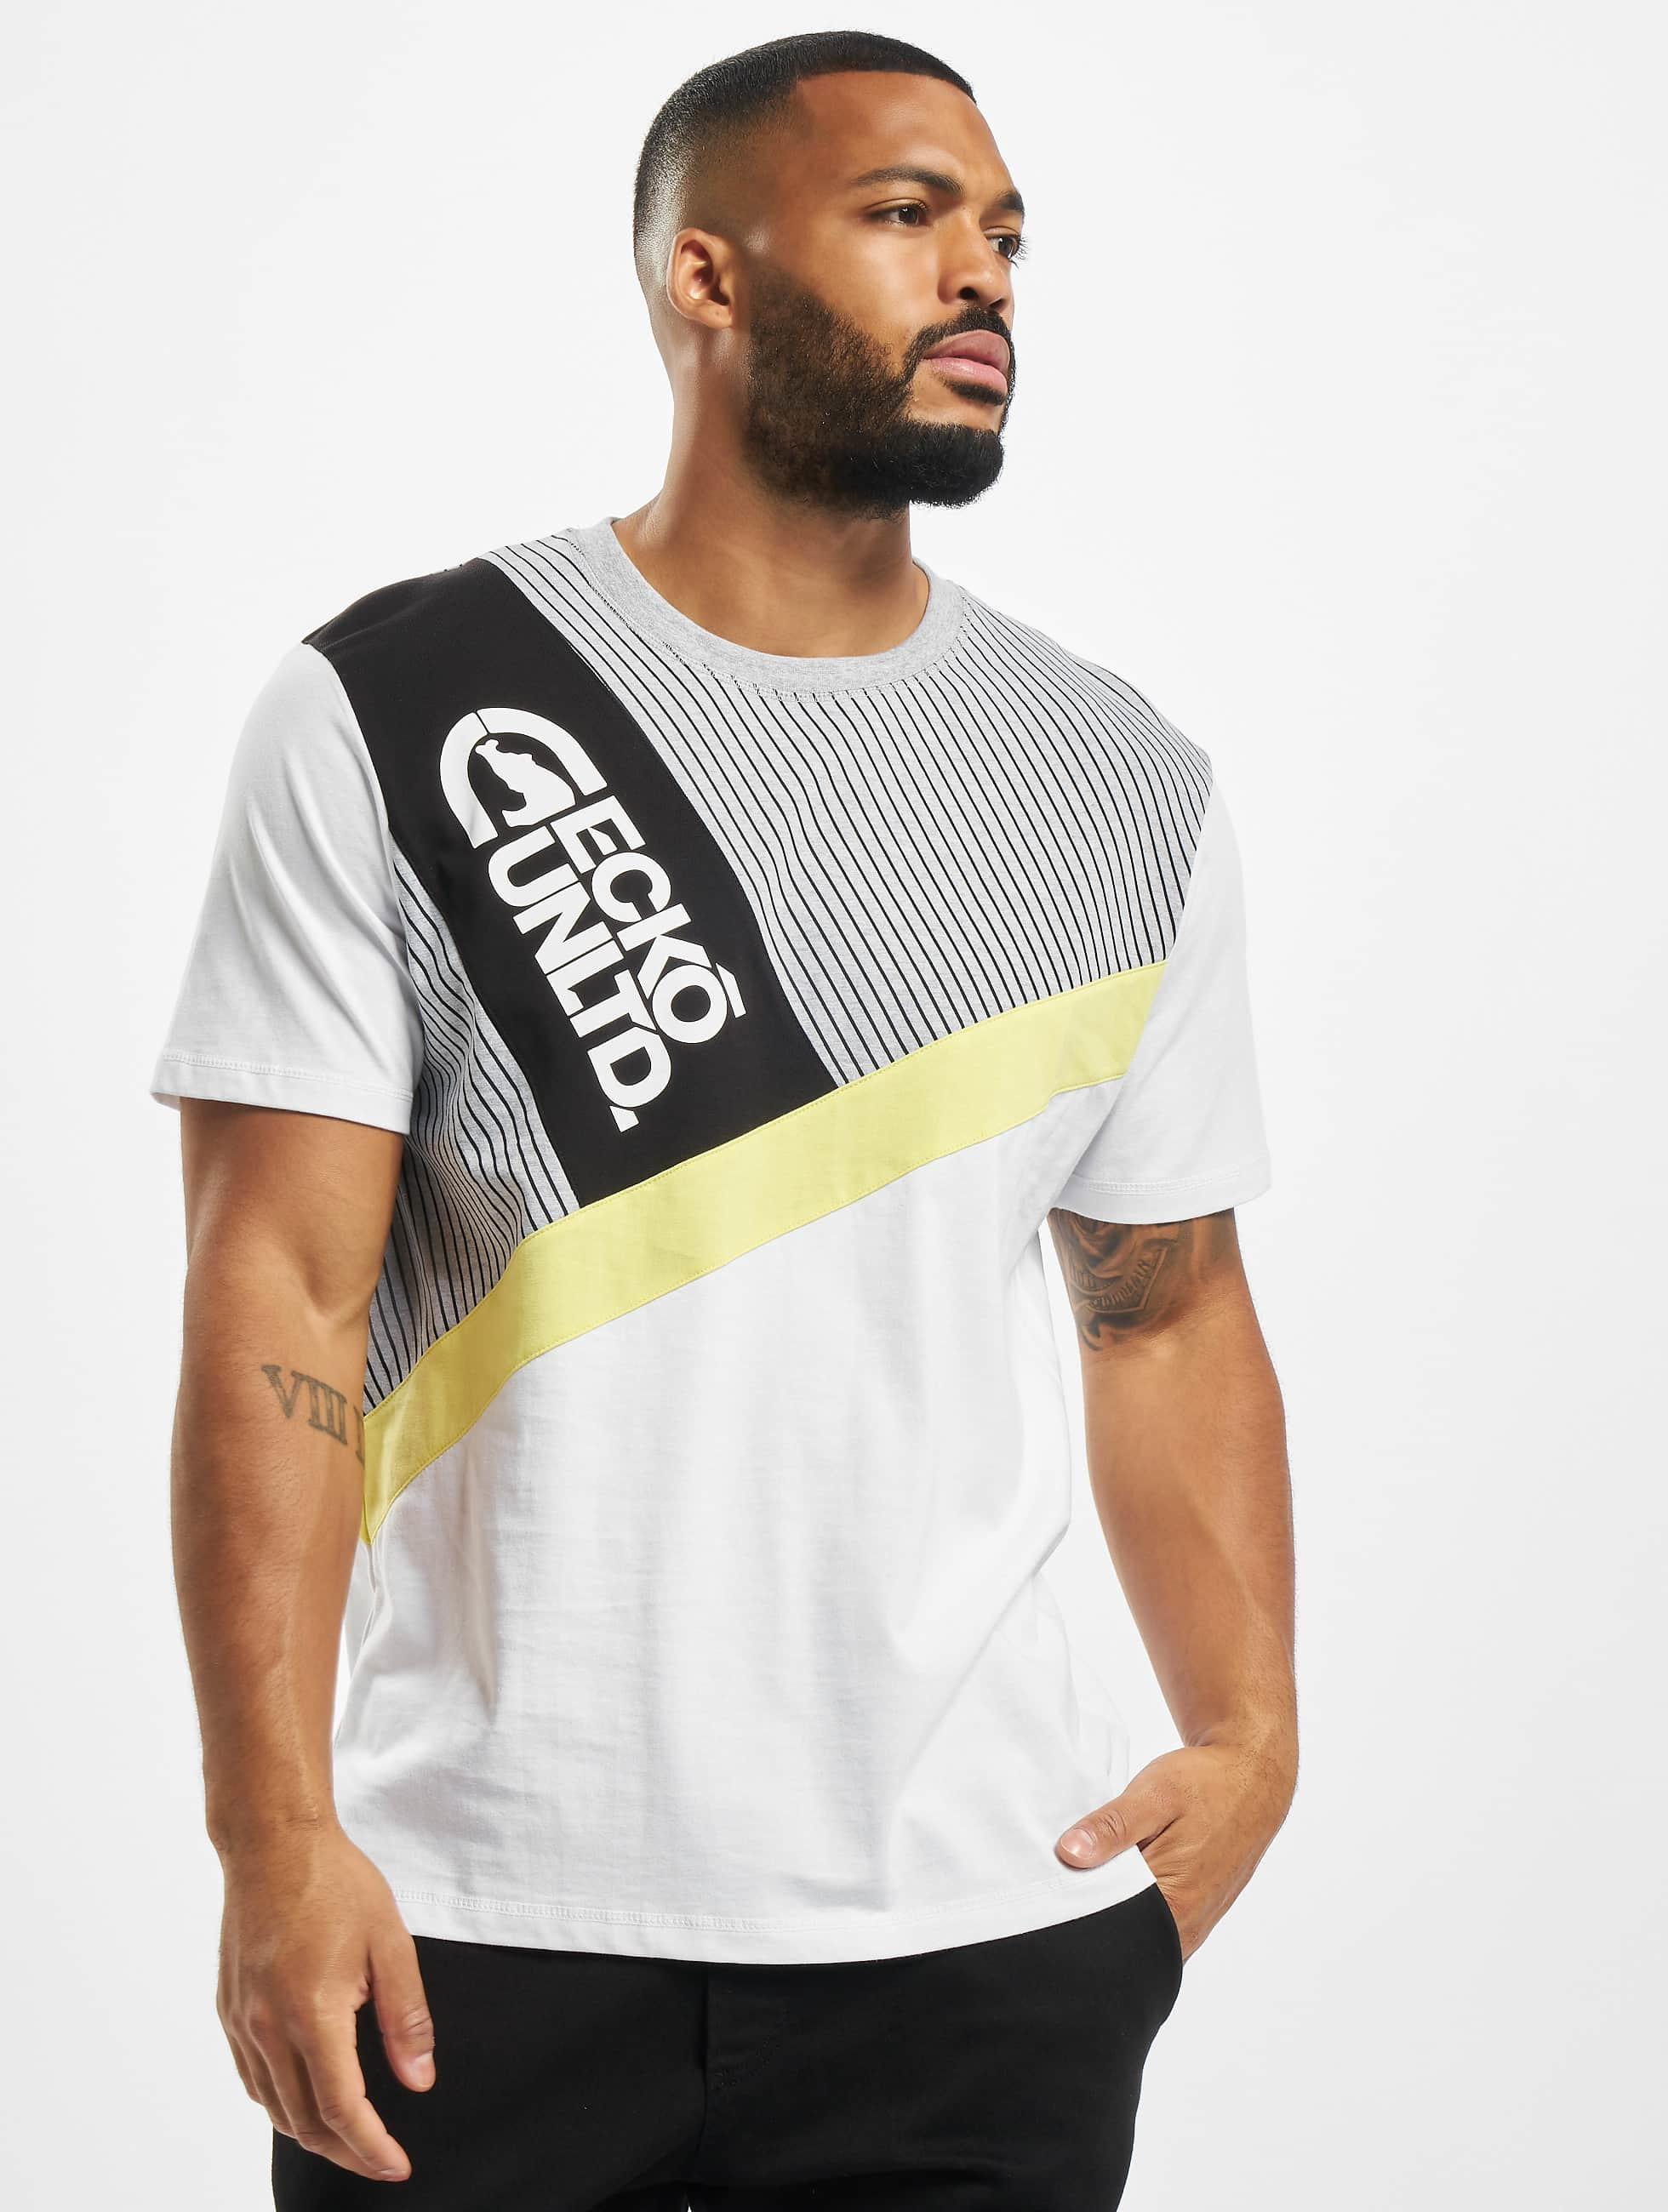 Ecko Unltd. / T-Shirt Jackso in white XL